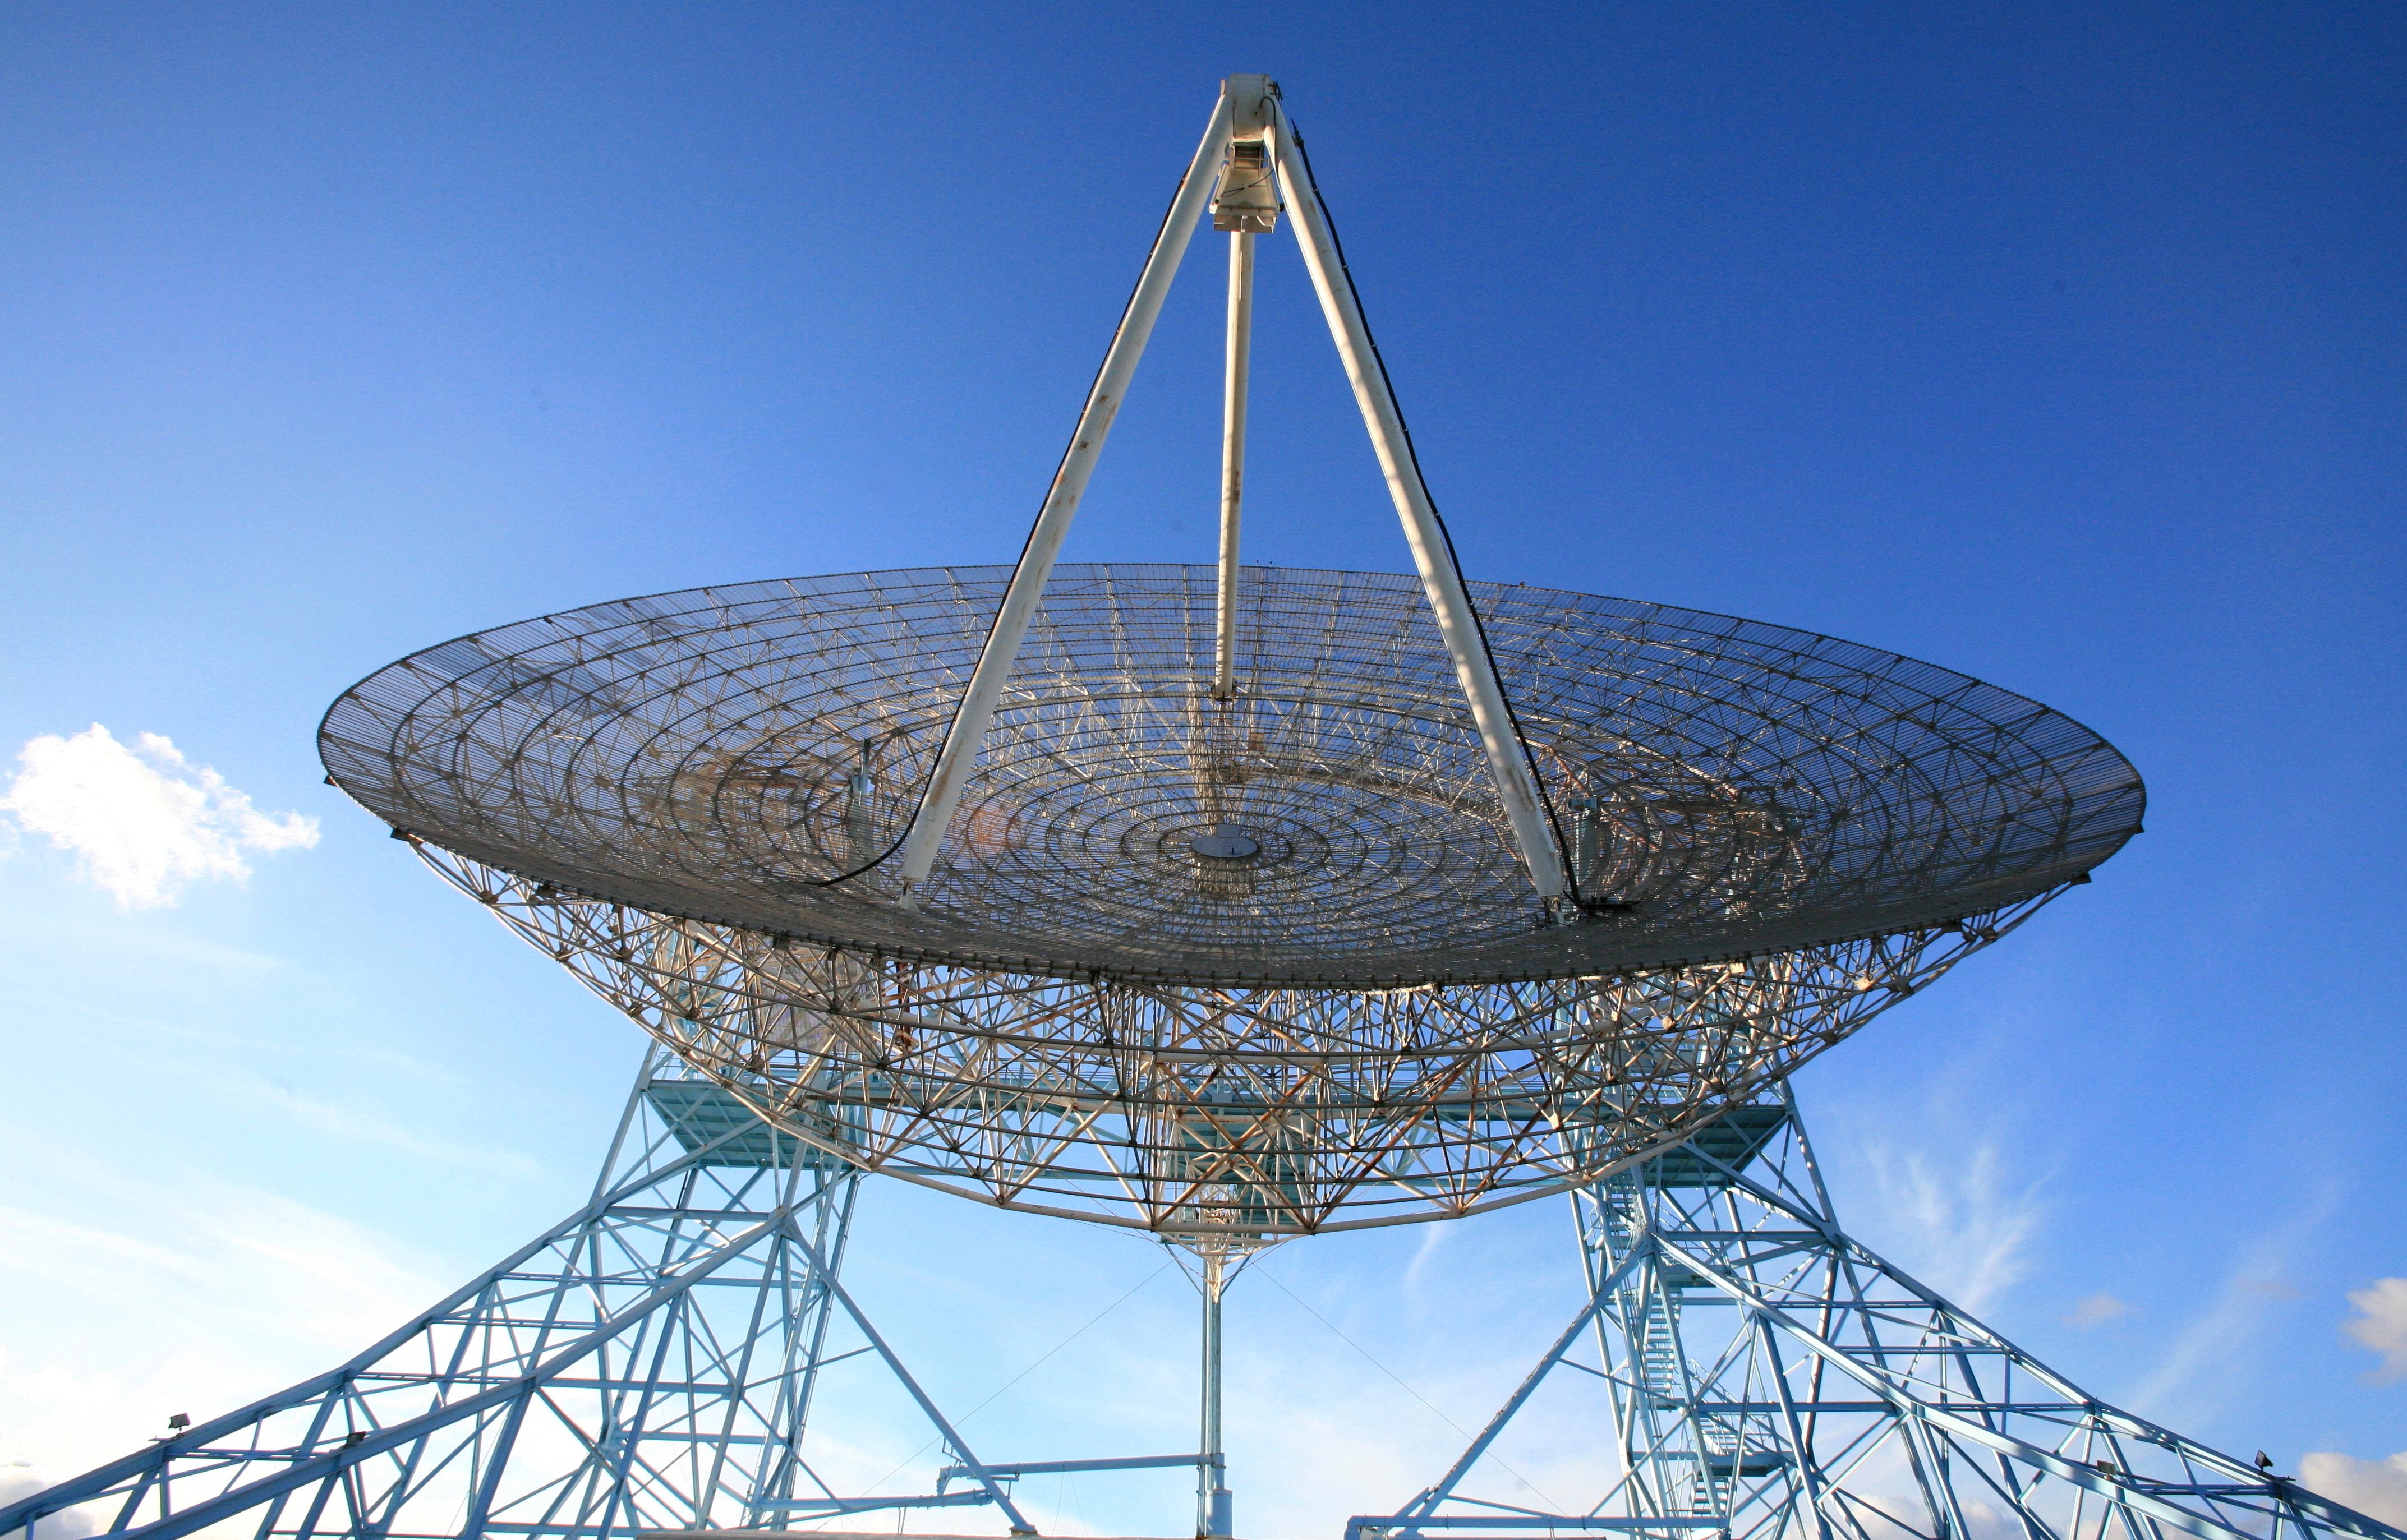 How to make own radio telescope